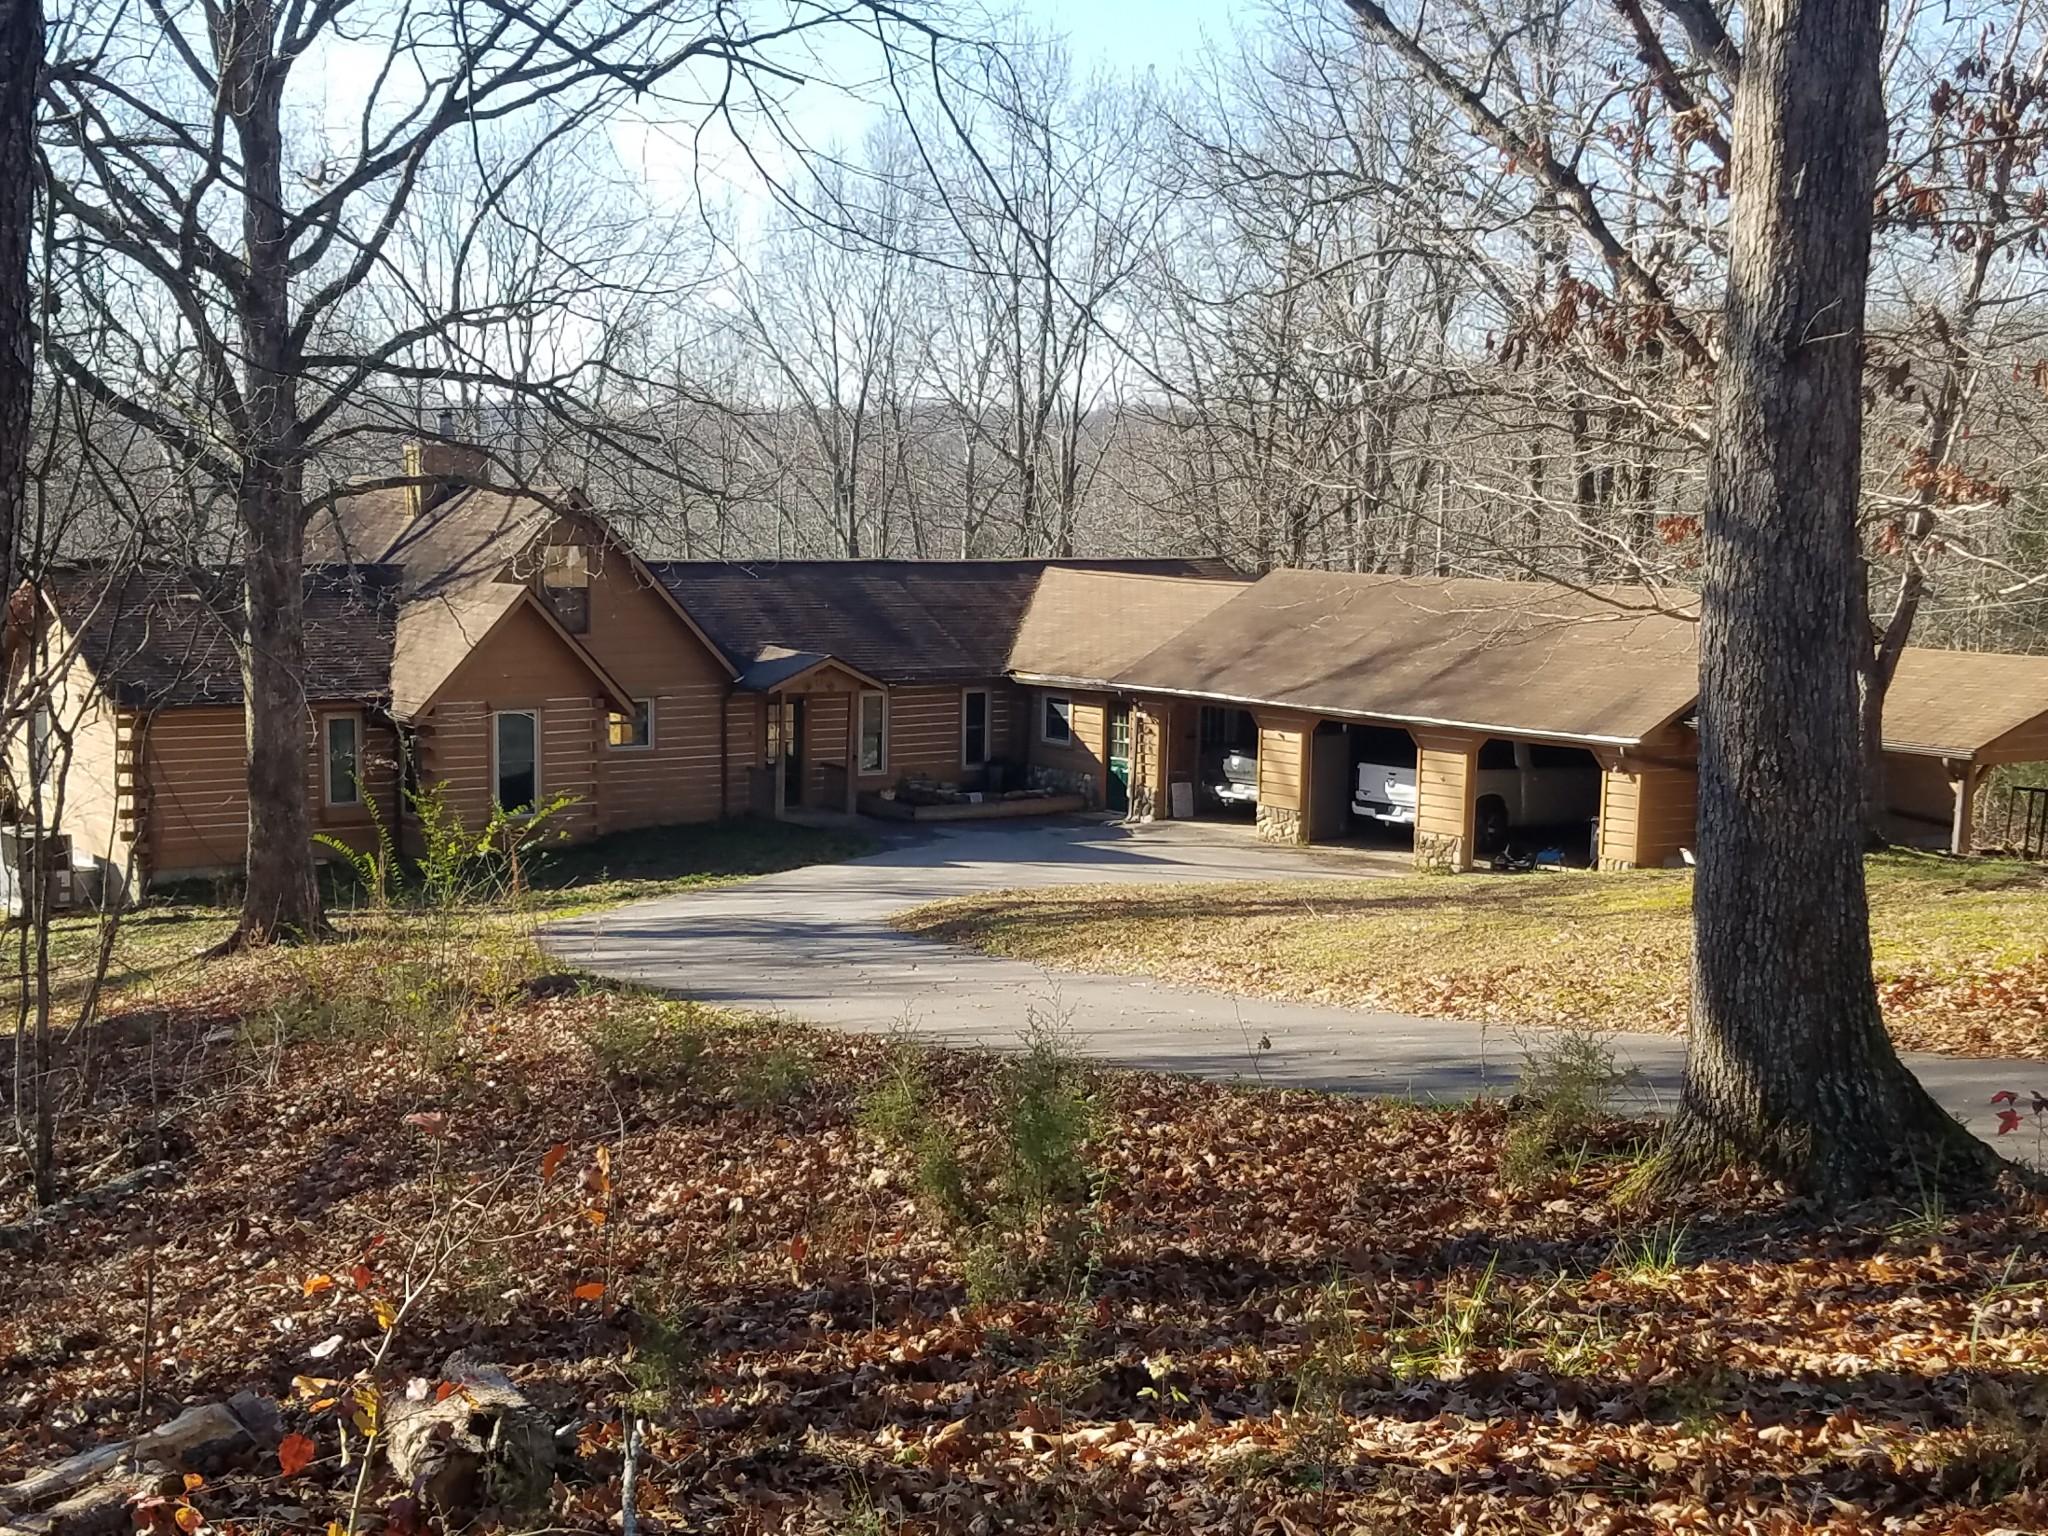 210 Jared Cir Property Photo - Big Rock, TN real estate listing